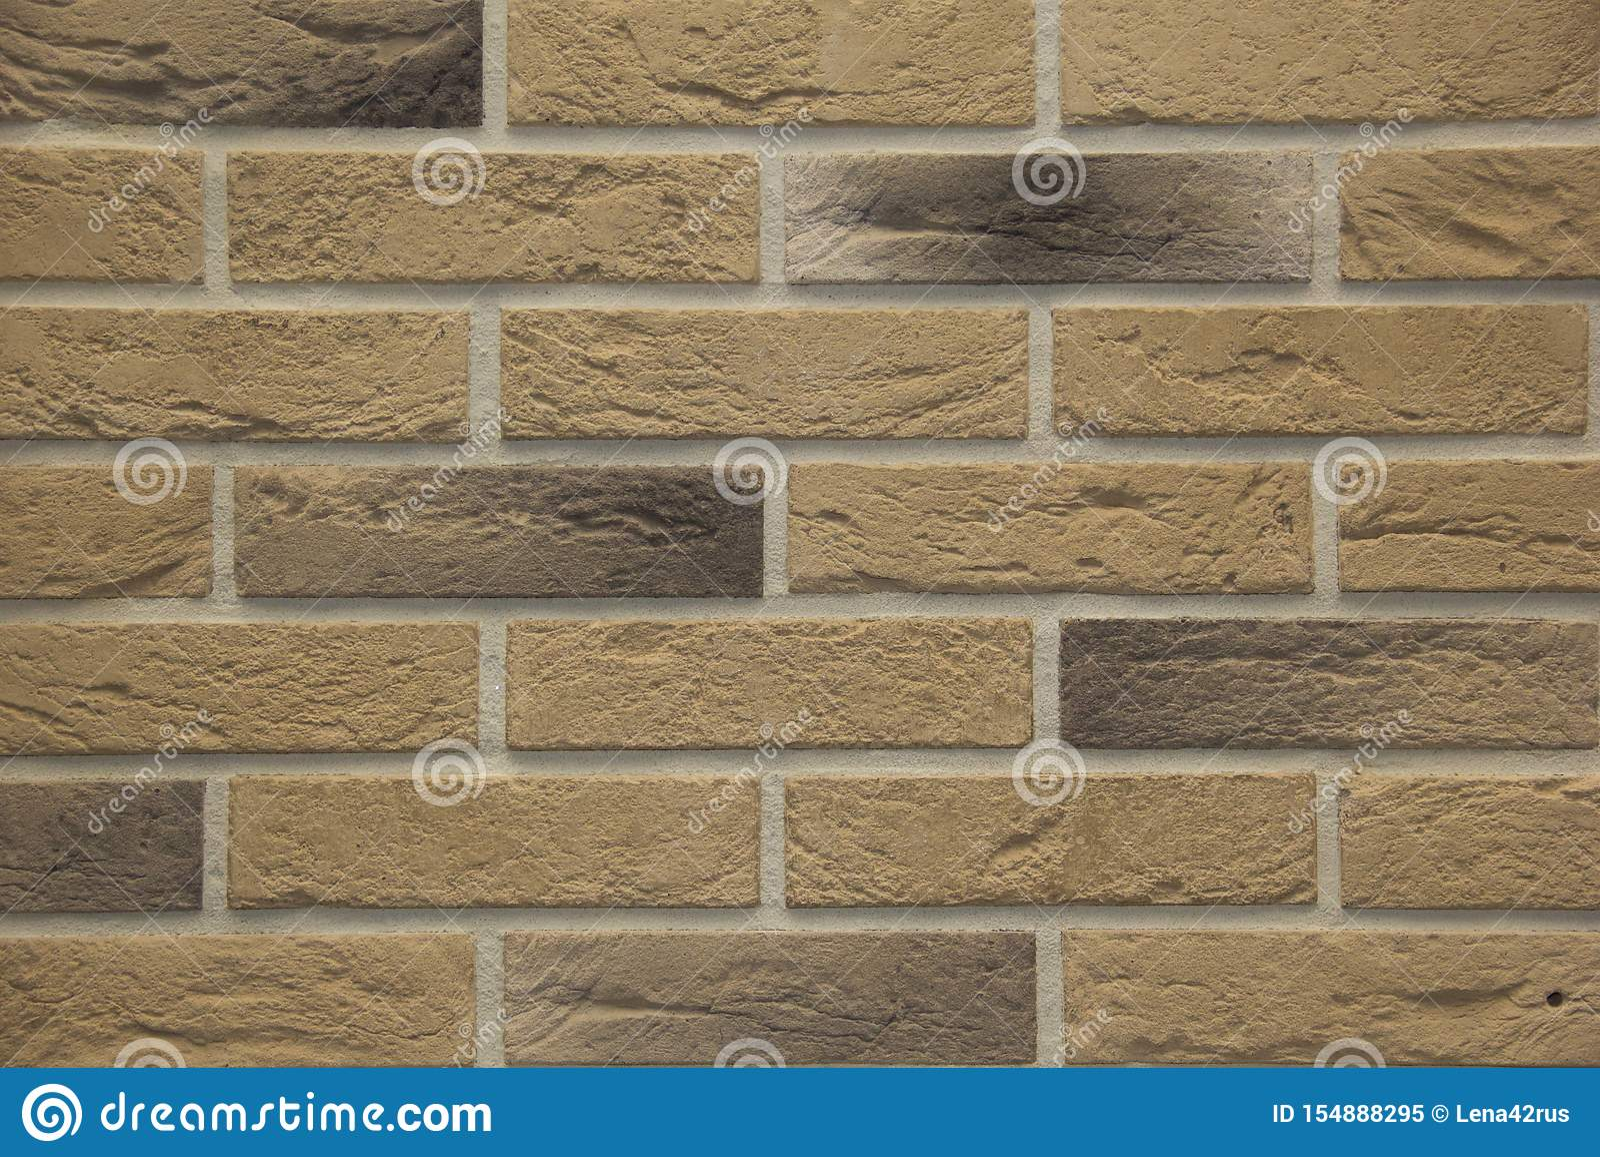 Decorative Bricks For Exterior Walls from thumbs.dreamstime.com